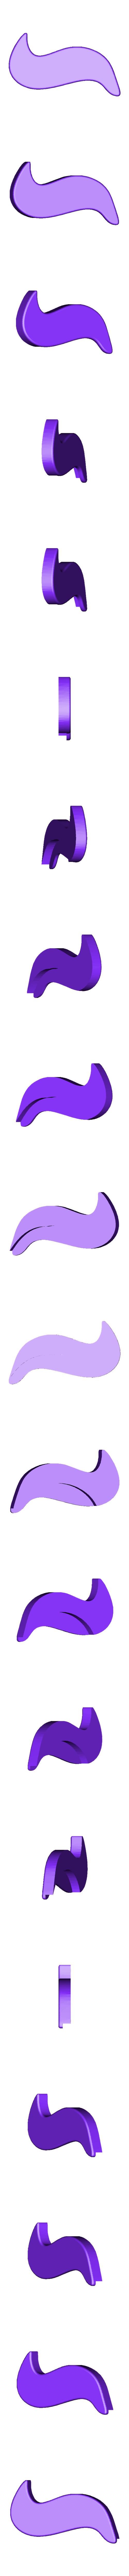 parrot_Trump.STL Download free STL file party parrot automata • 3D printable design, melonshu